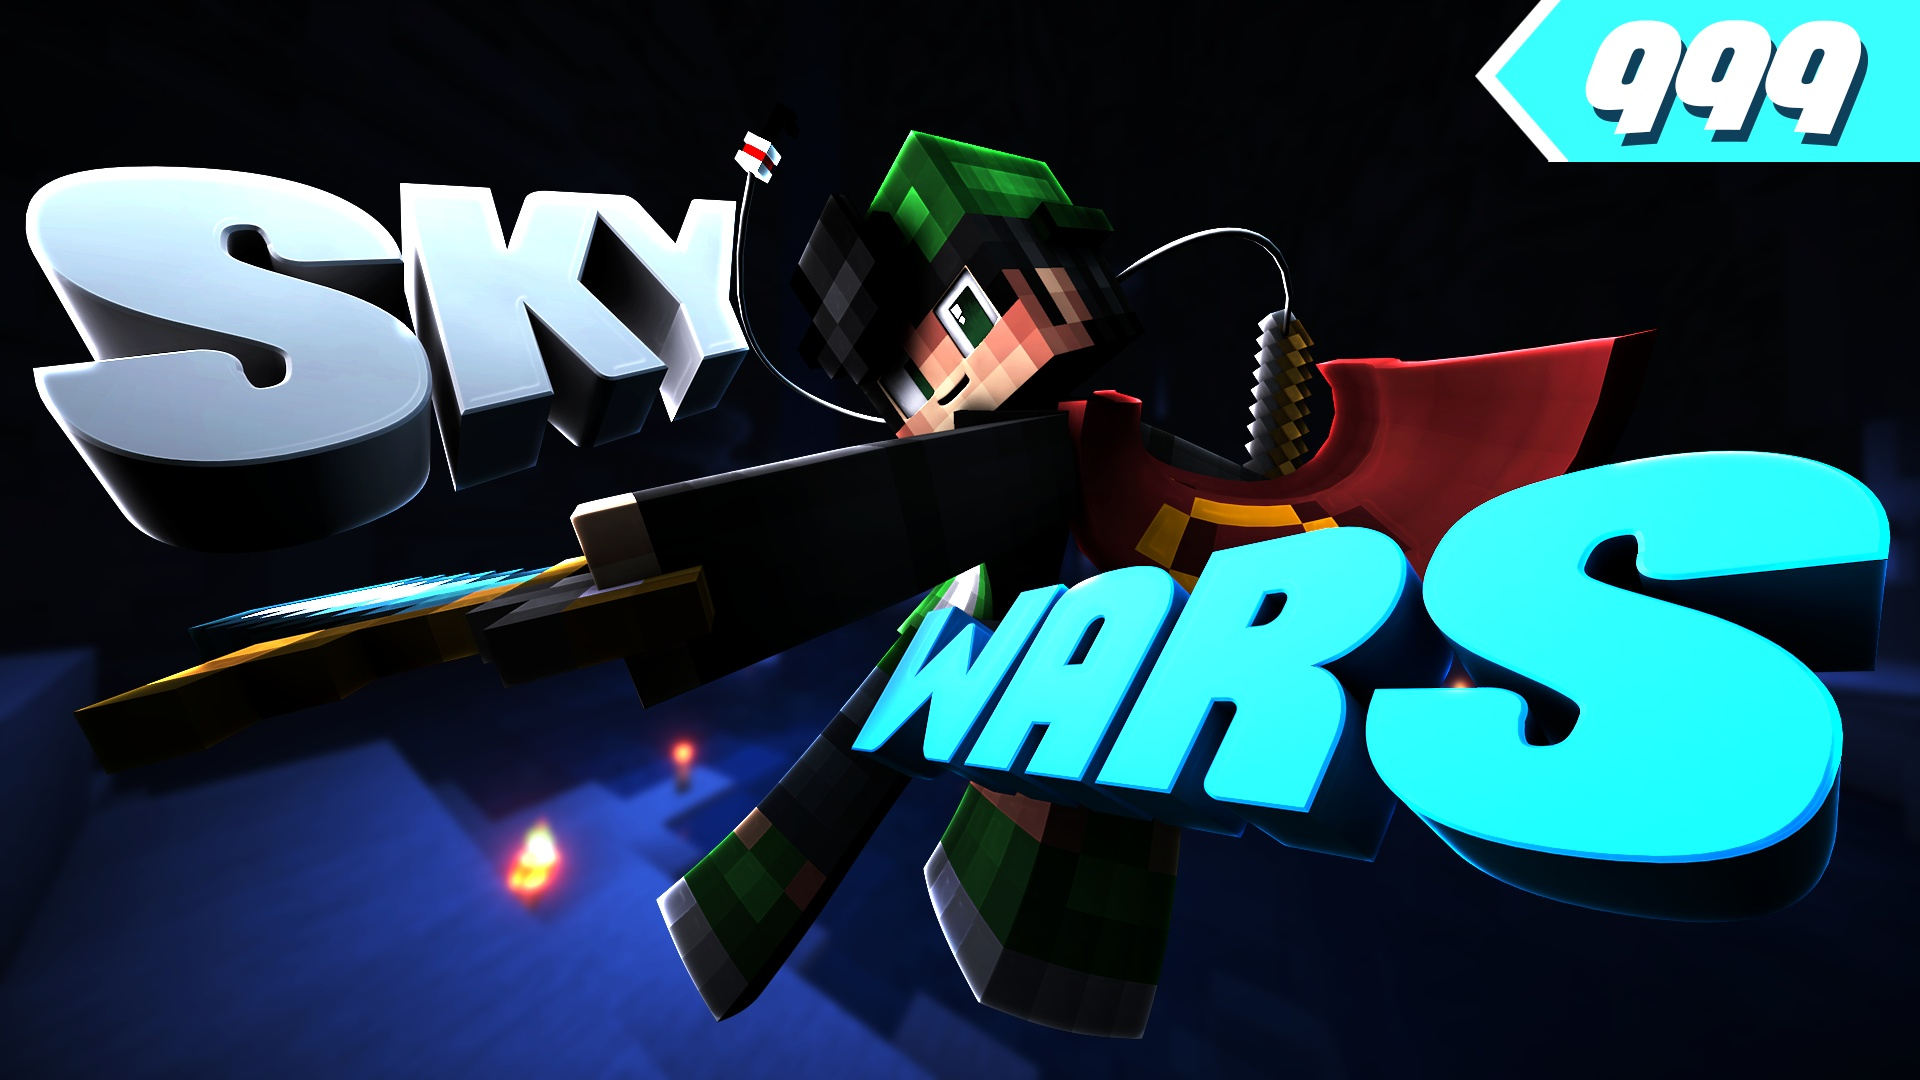 - [Minecraft] YouTube Thumbnail -